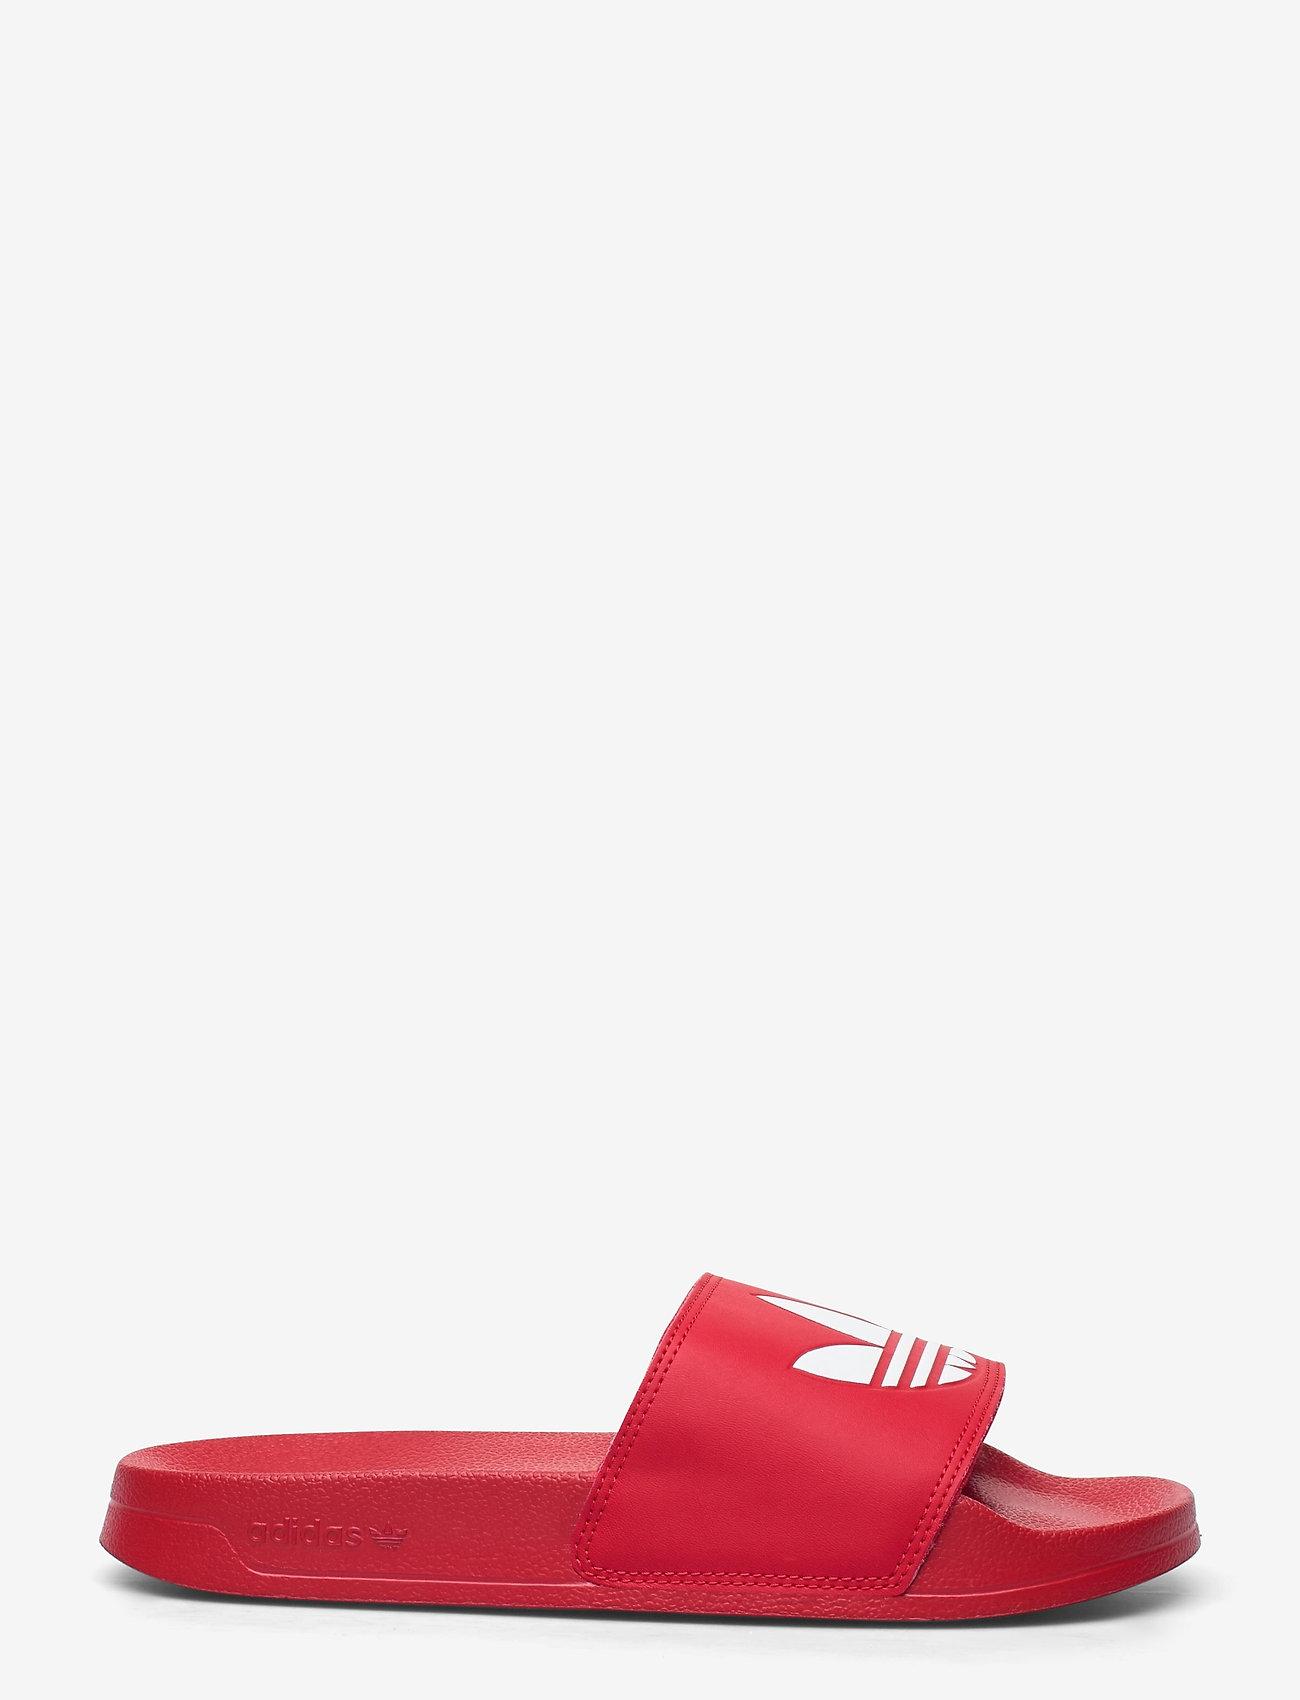 adidas Originals - Adilette Lite Slides - tennarit - scarle/ftwwht/scarle - 1